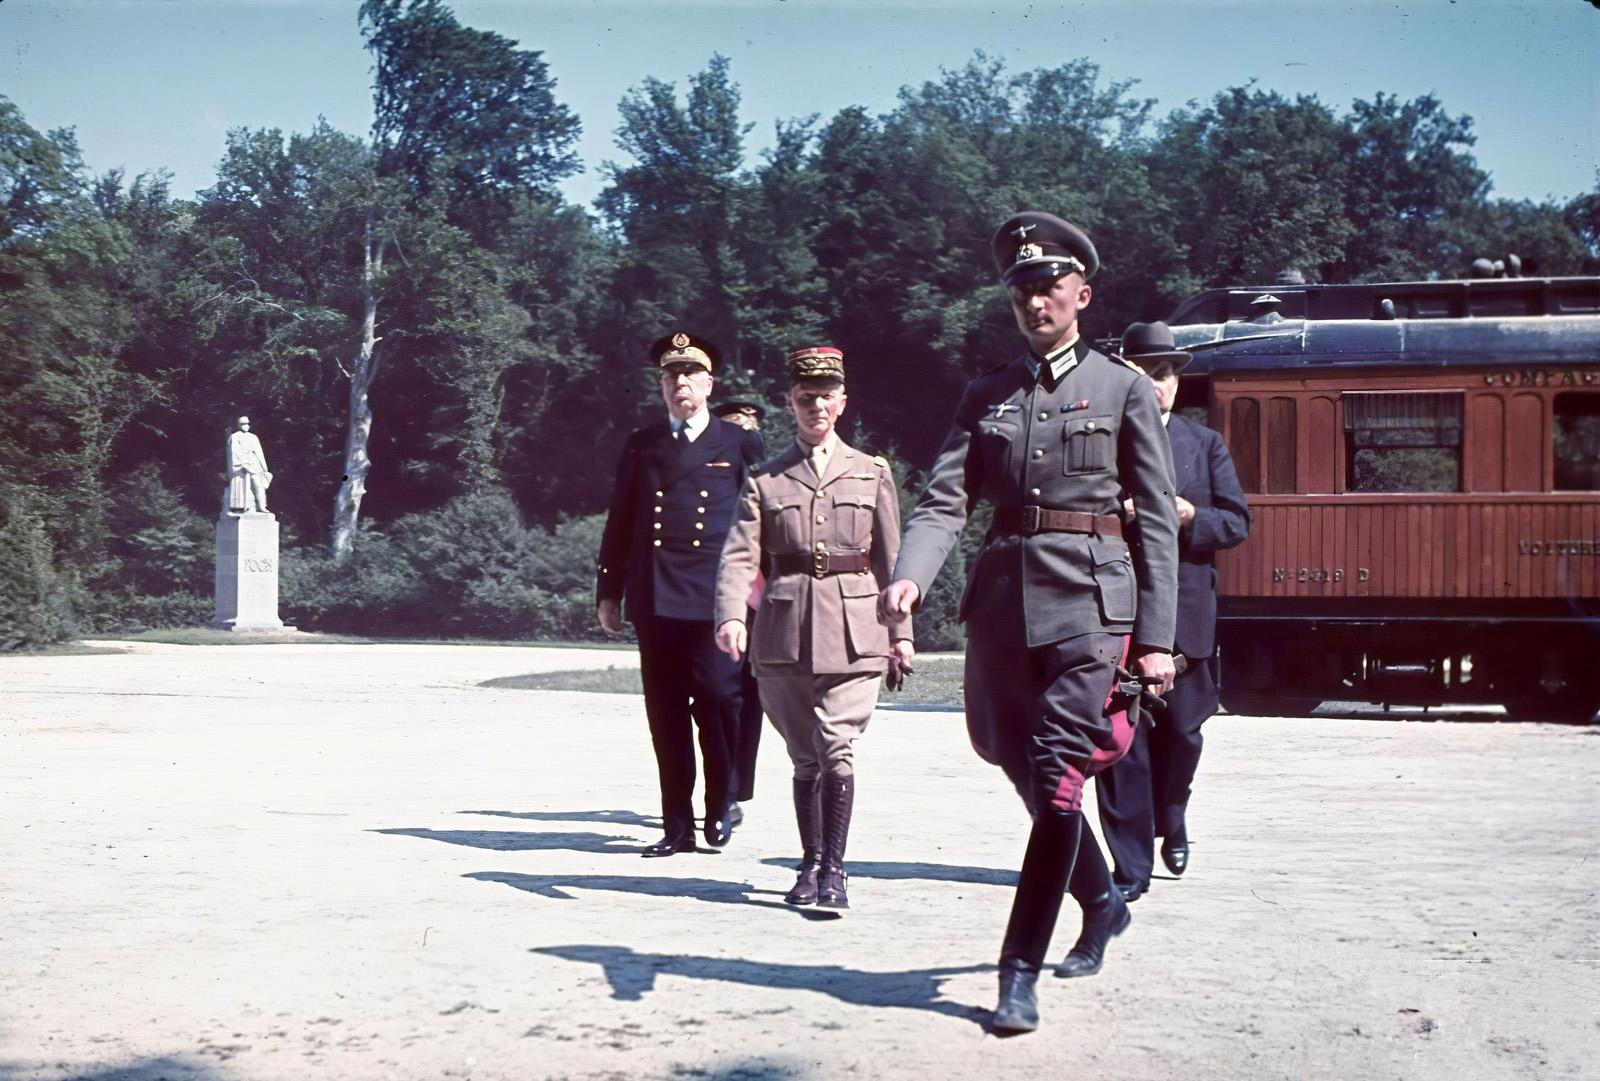 1940 june 21, Compigne General Huntziger